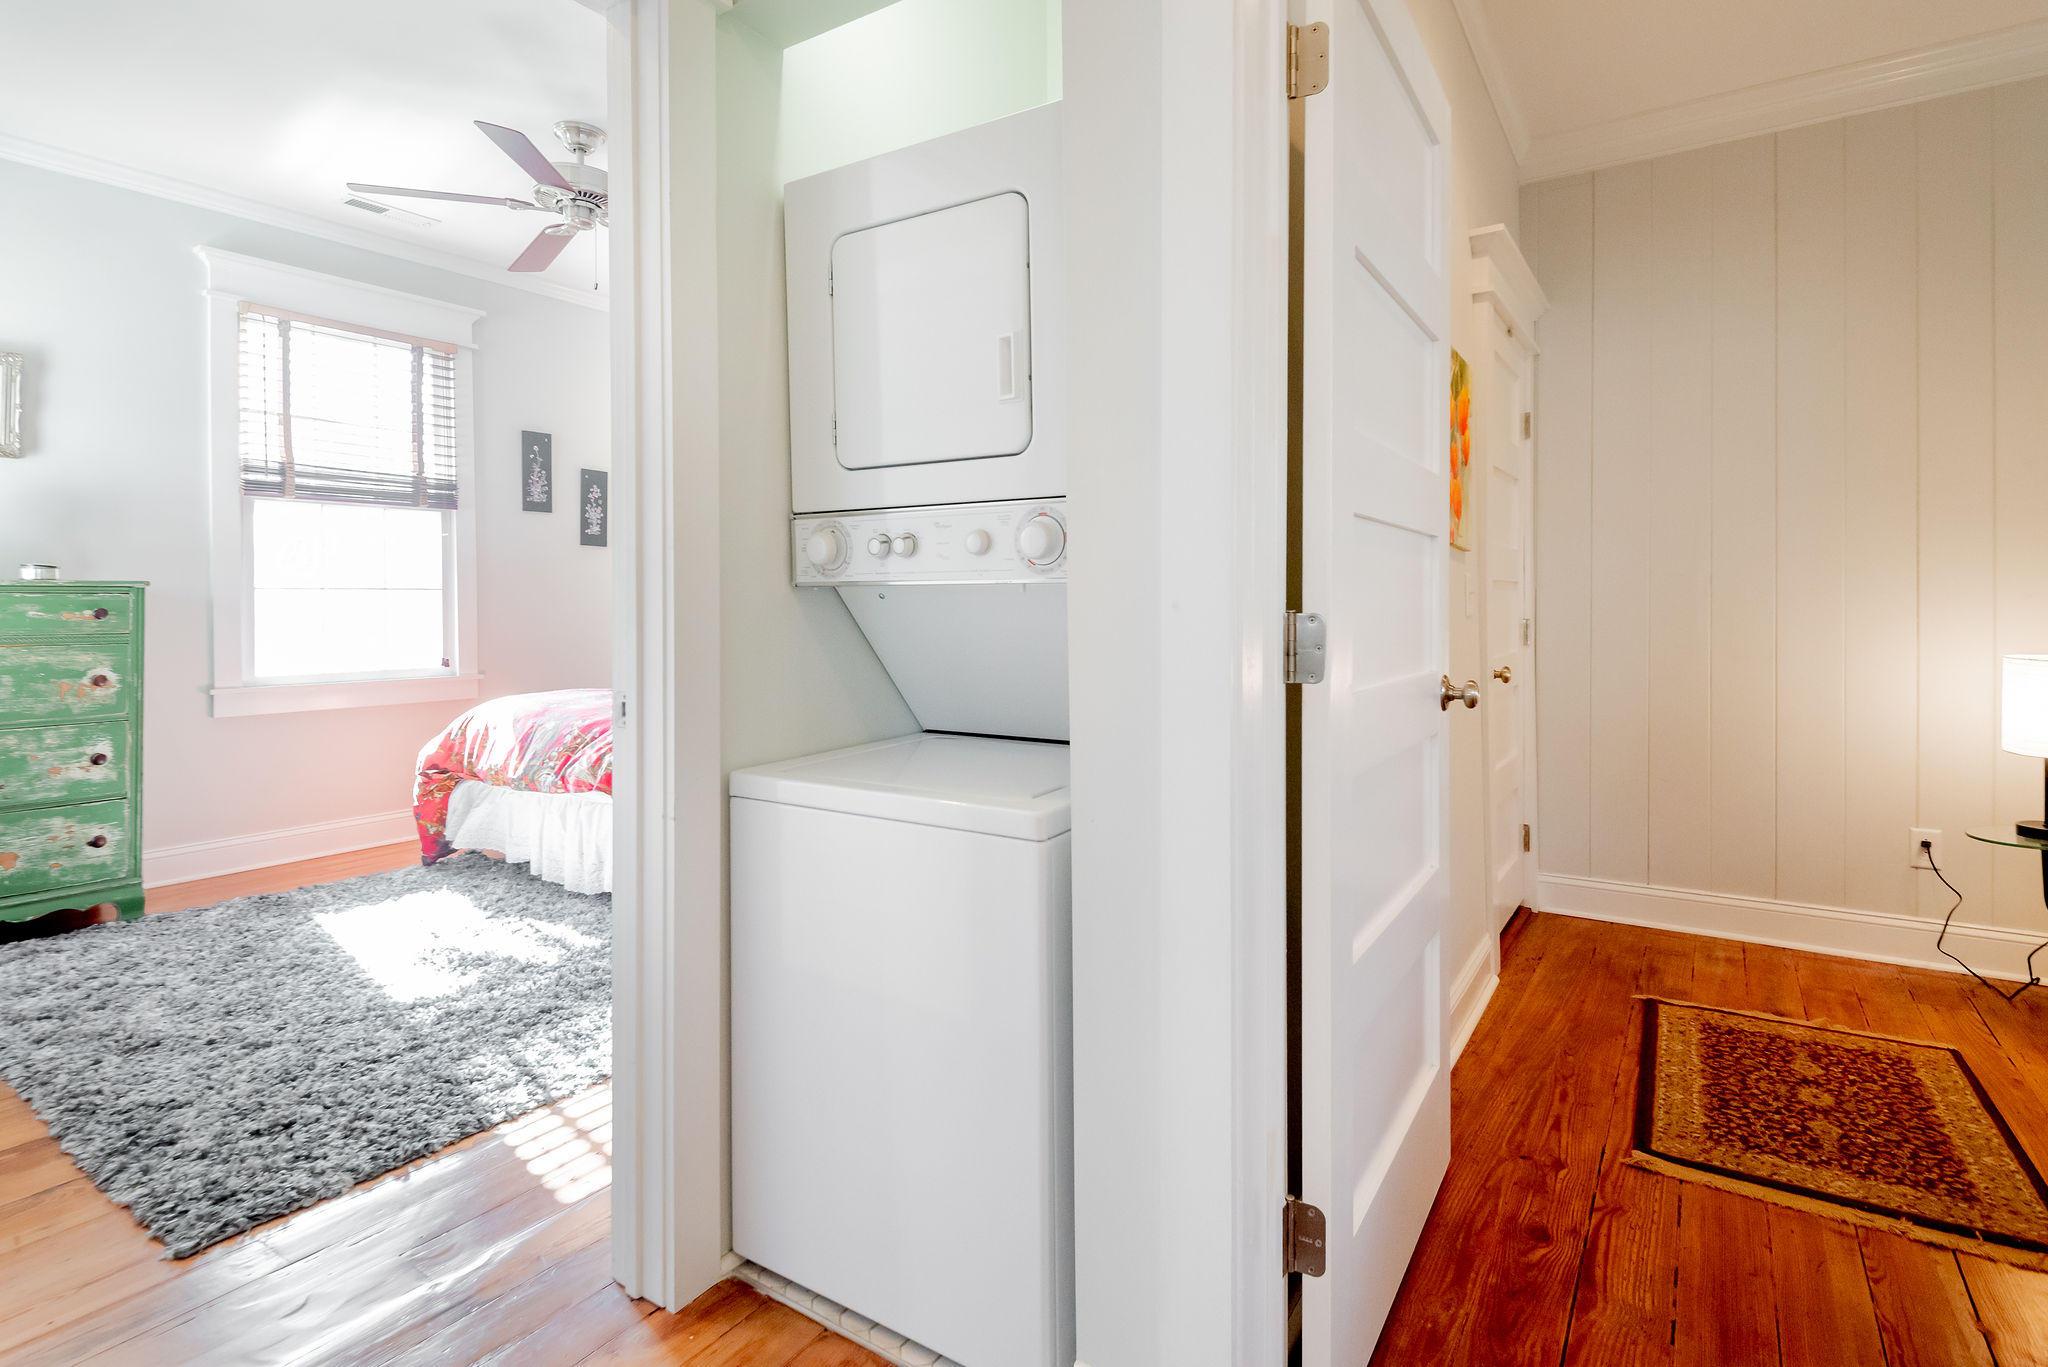 Elliotborough Homes For Sale - 29 Sires, Charleston, SC - 1